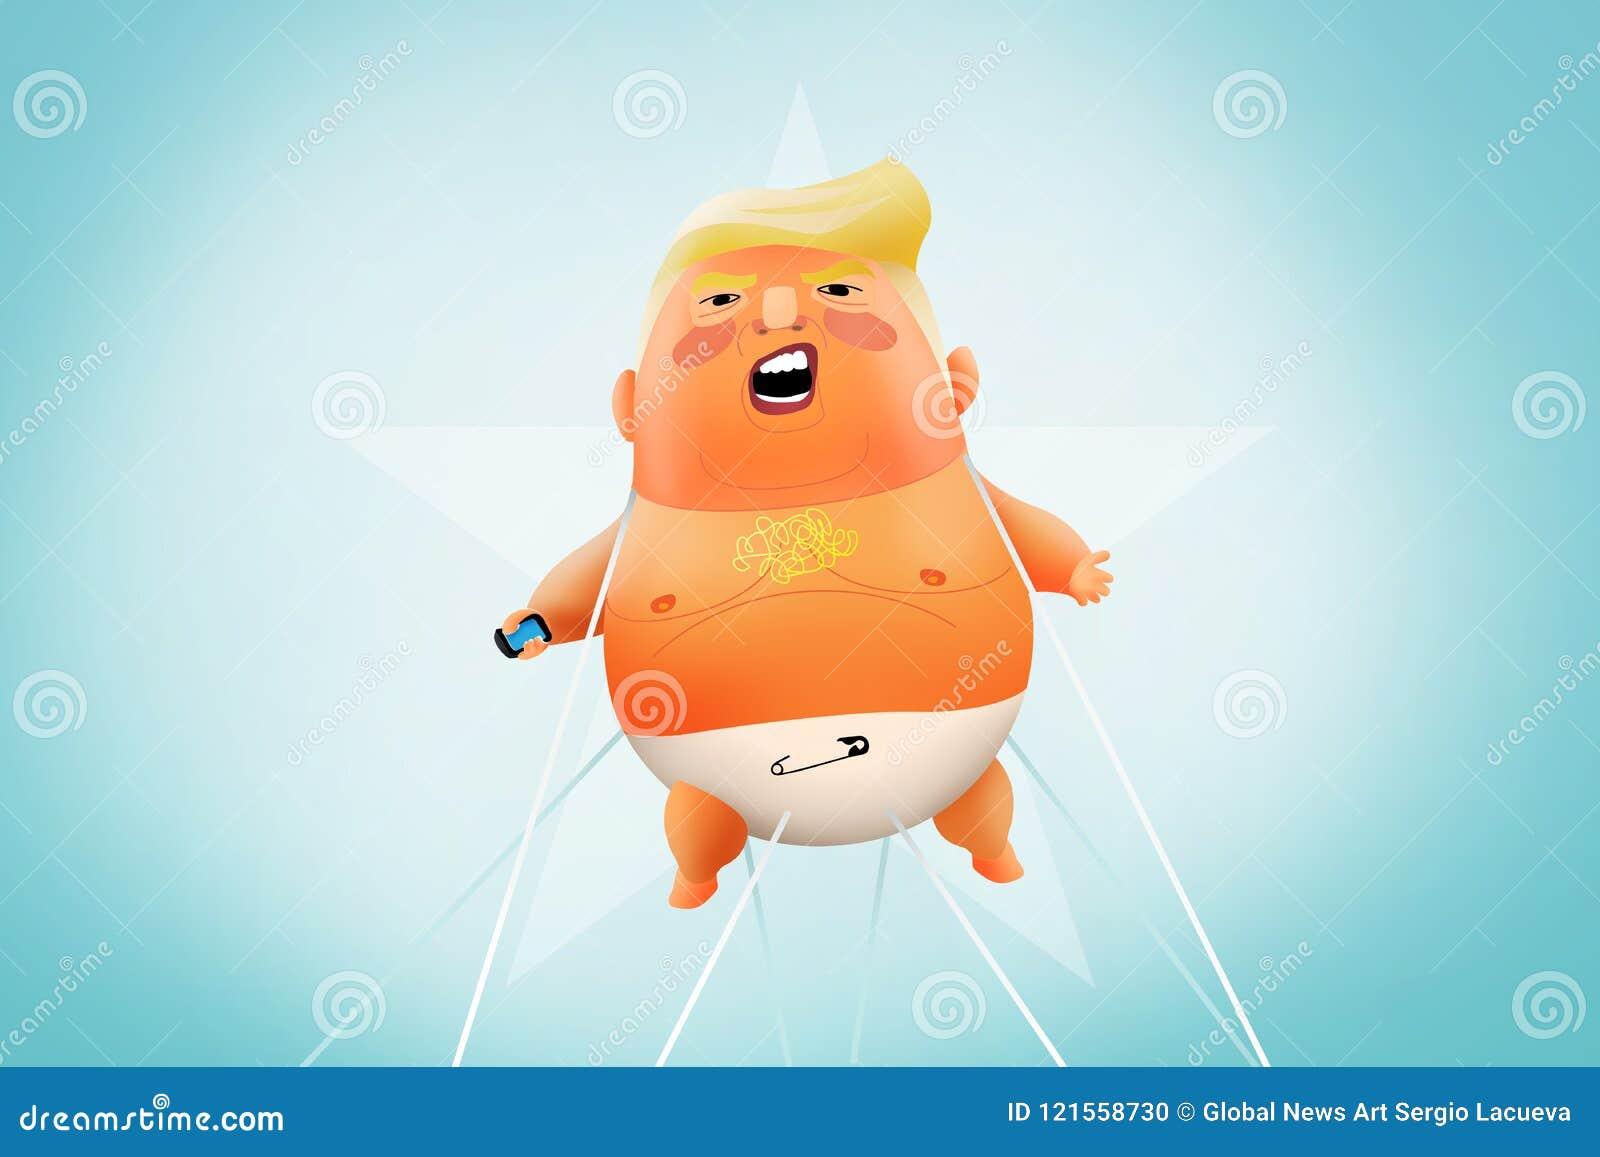 Baby-Trump Blimp